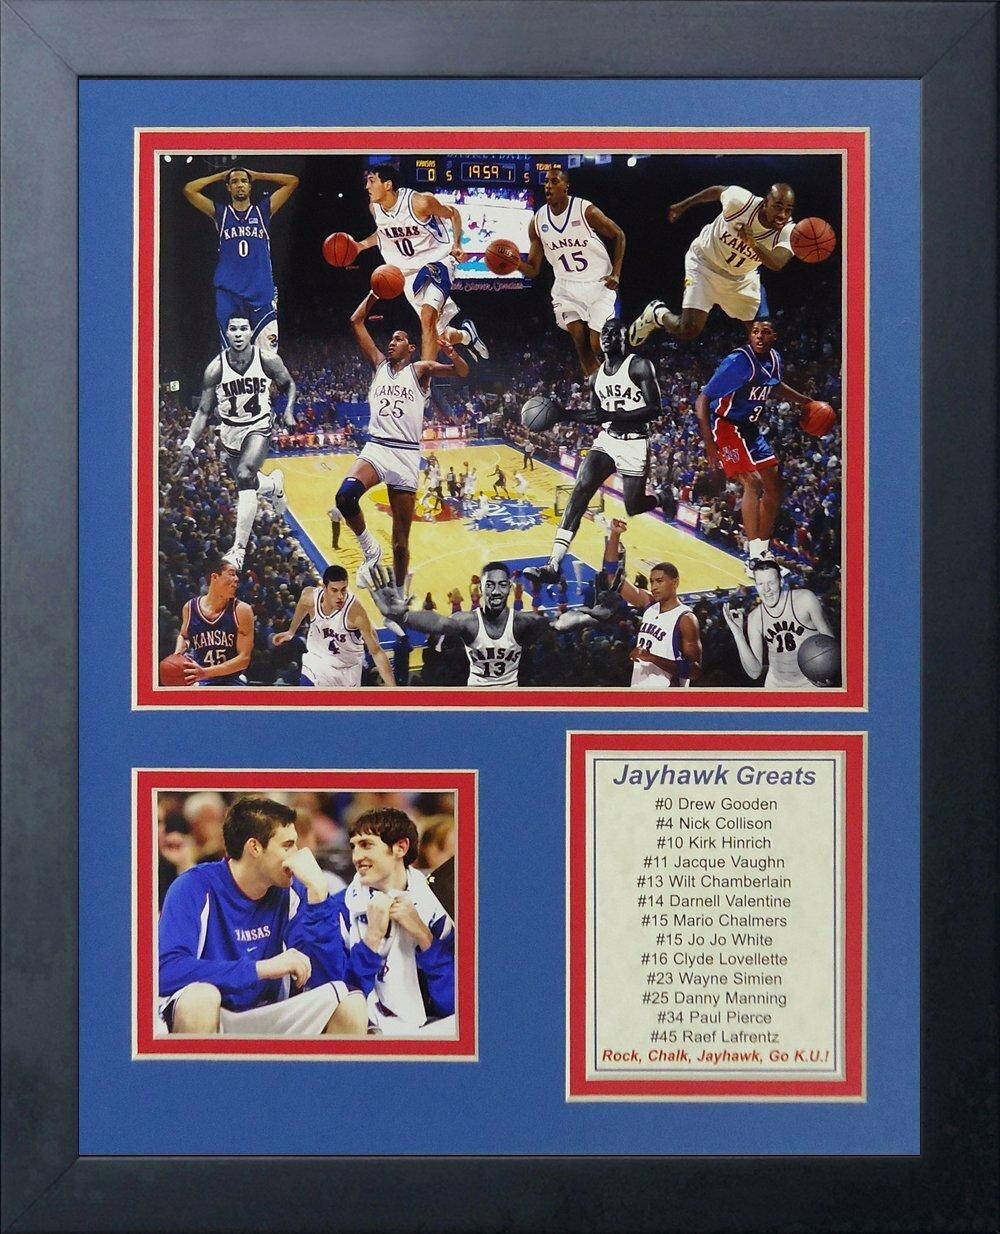 11 x 14 Legends Never Die Paul Pierce Kansas Jayhawks Collage Photo Frame